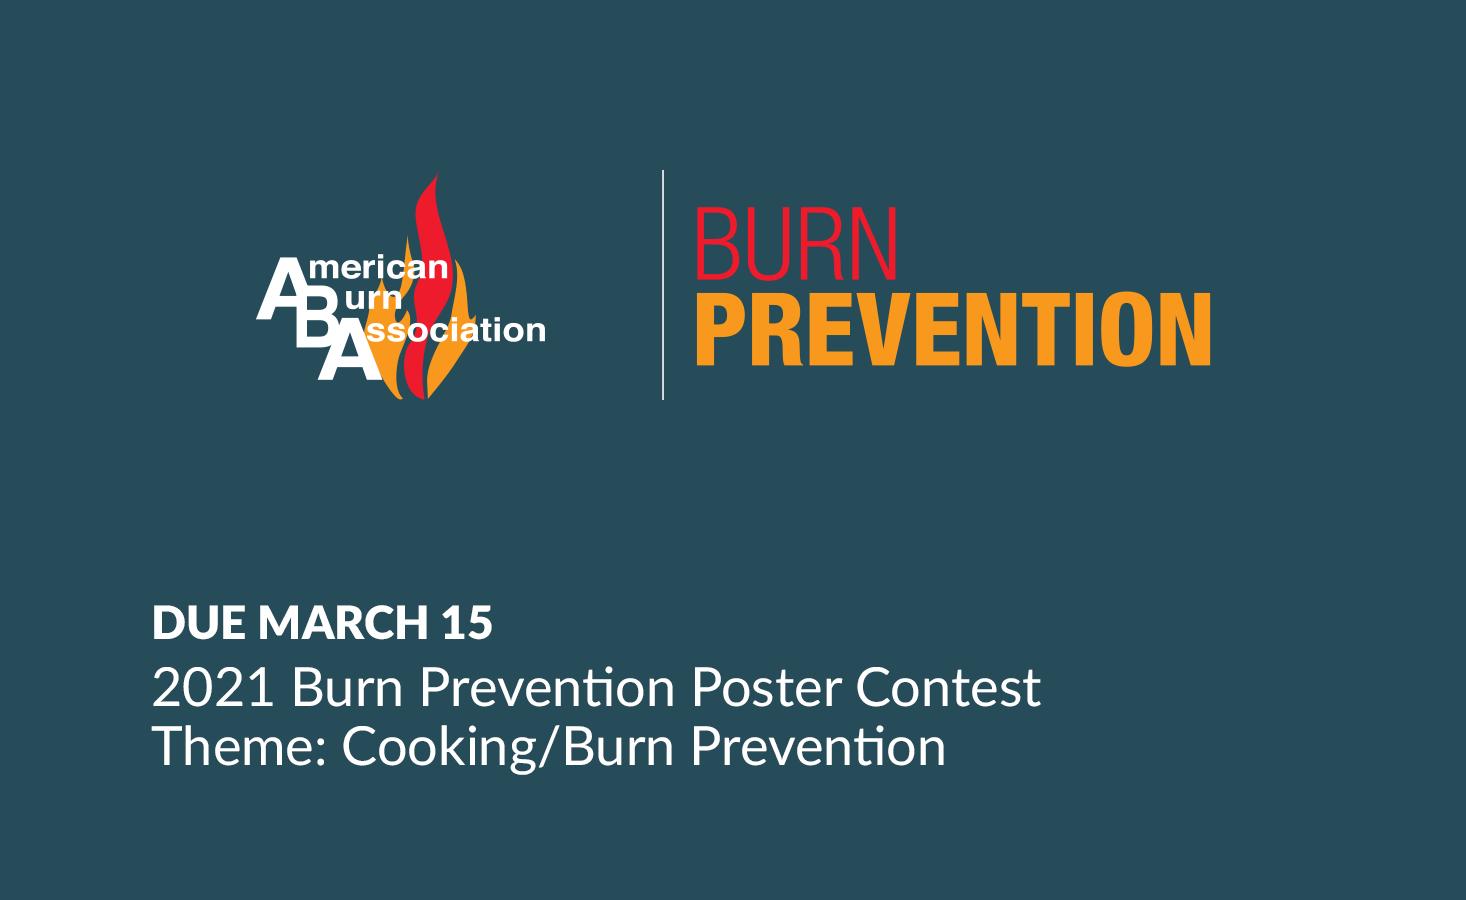 Burn Prevention Poster Contest